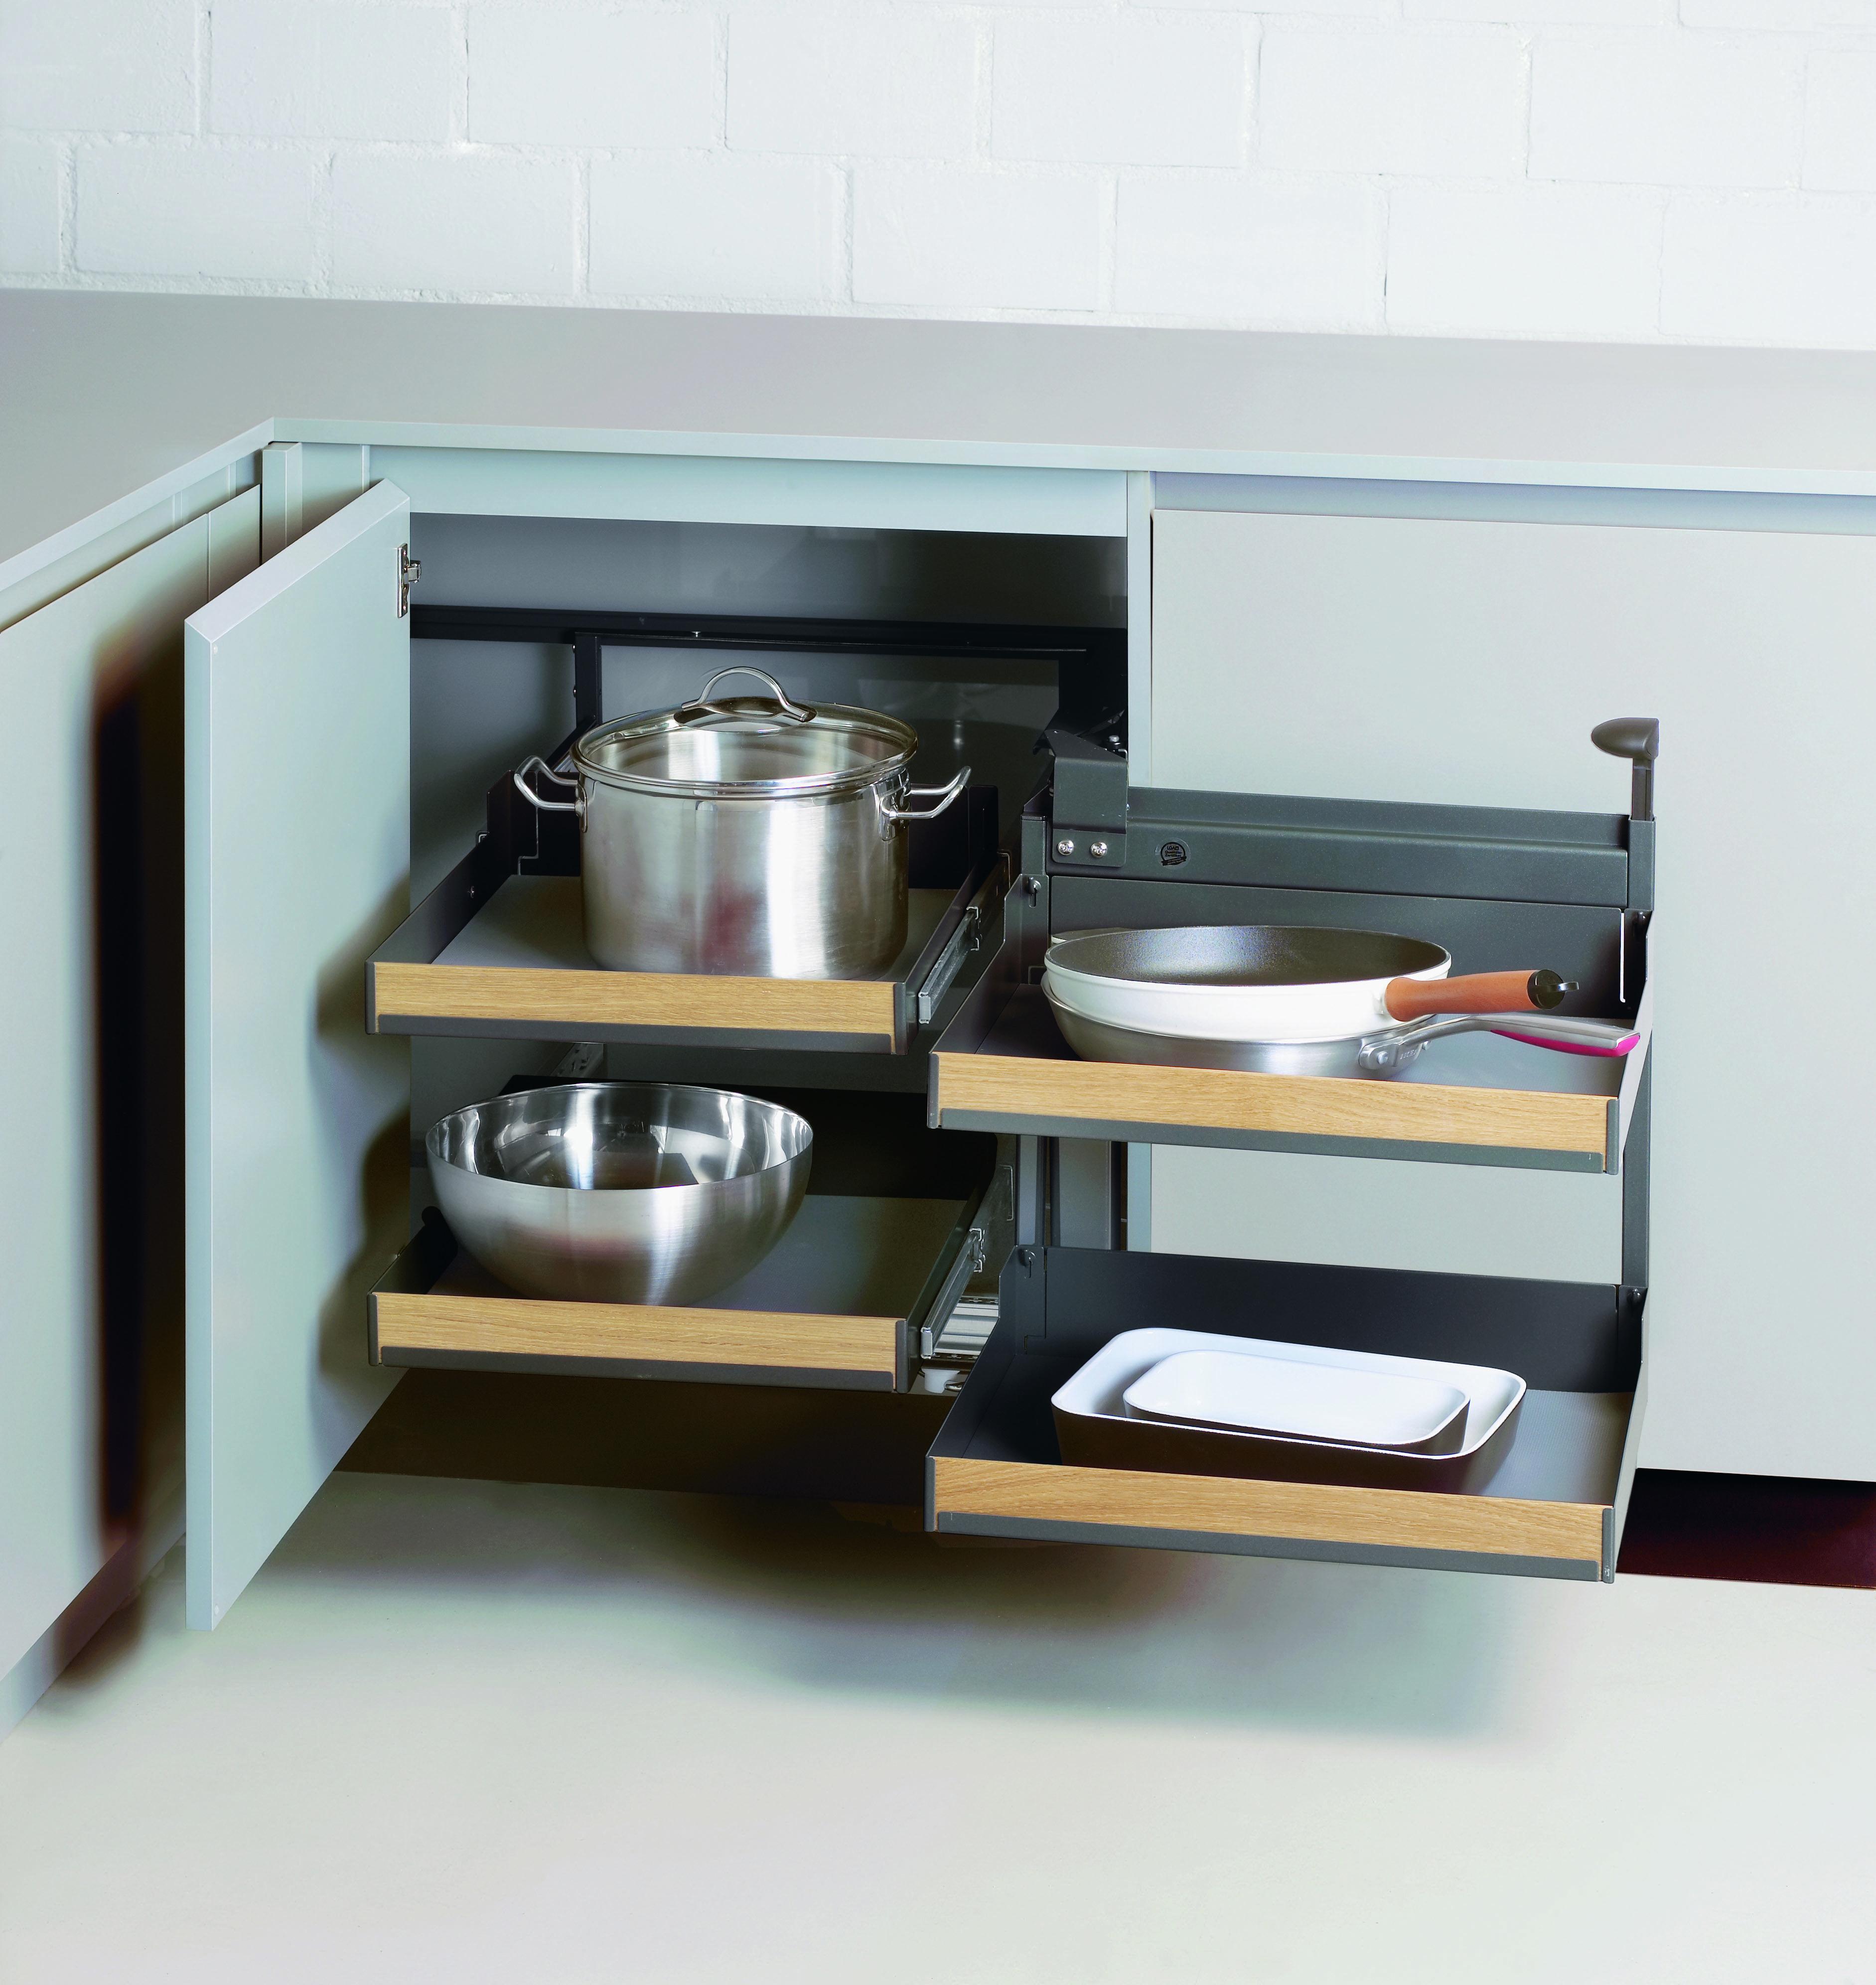 keuken carrousel le mans prijs : Pin By Peka System Ag On Corner Units Pinterest Corner Unit